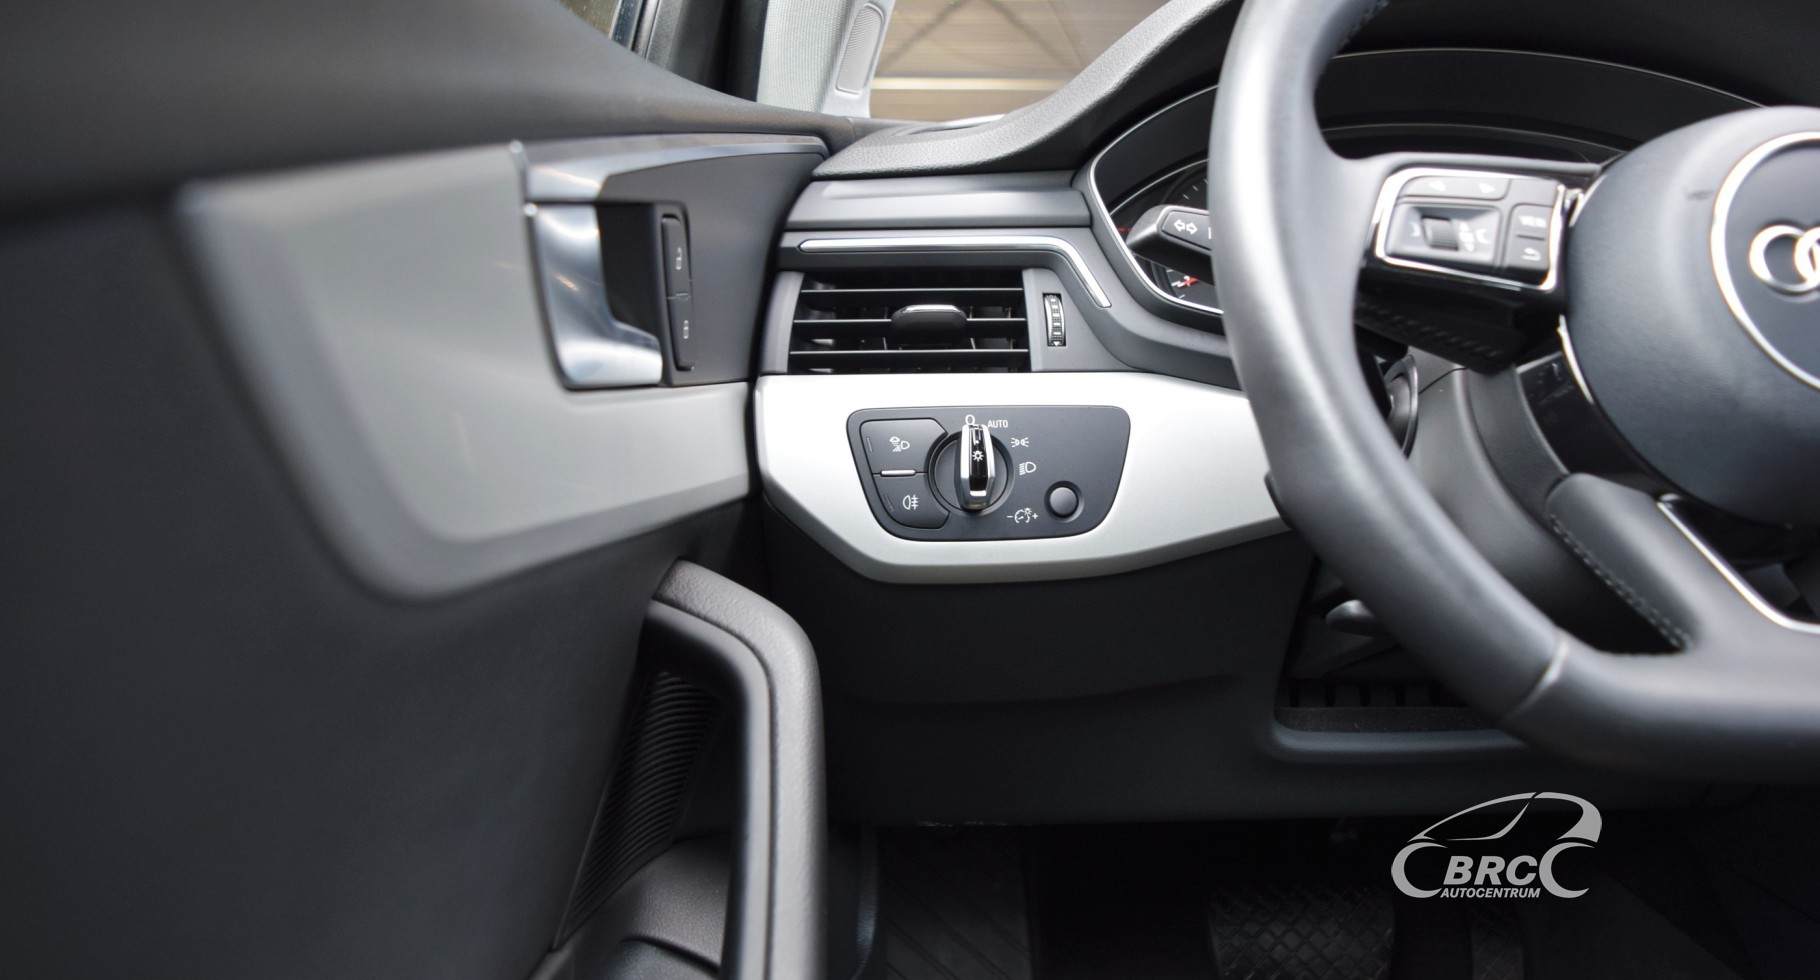 Audi A4 Allroad 3.0TDI Quattro